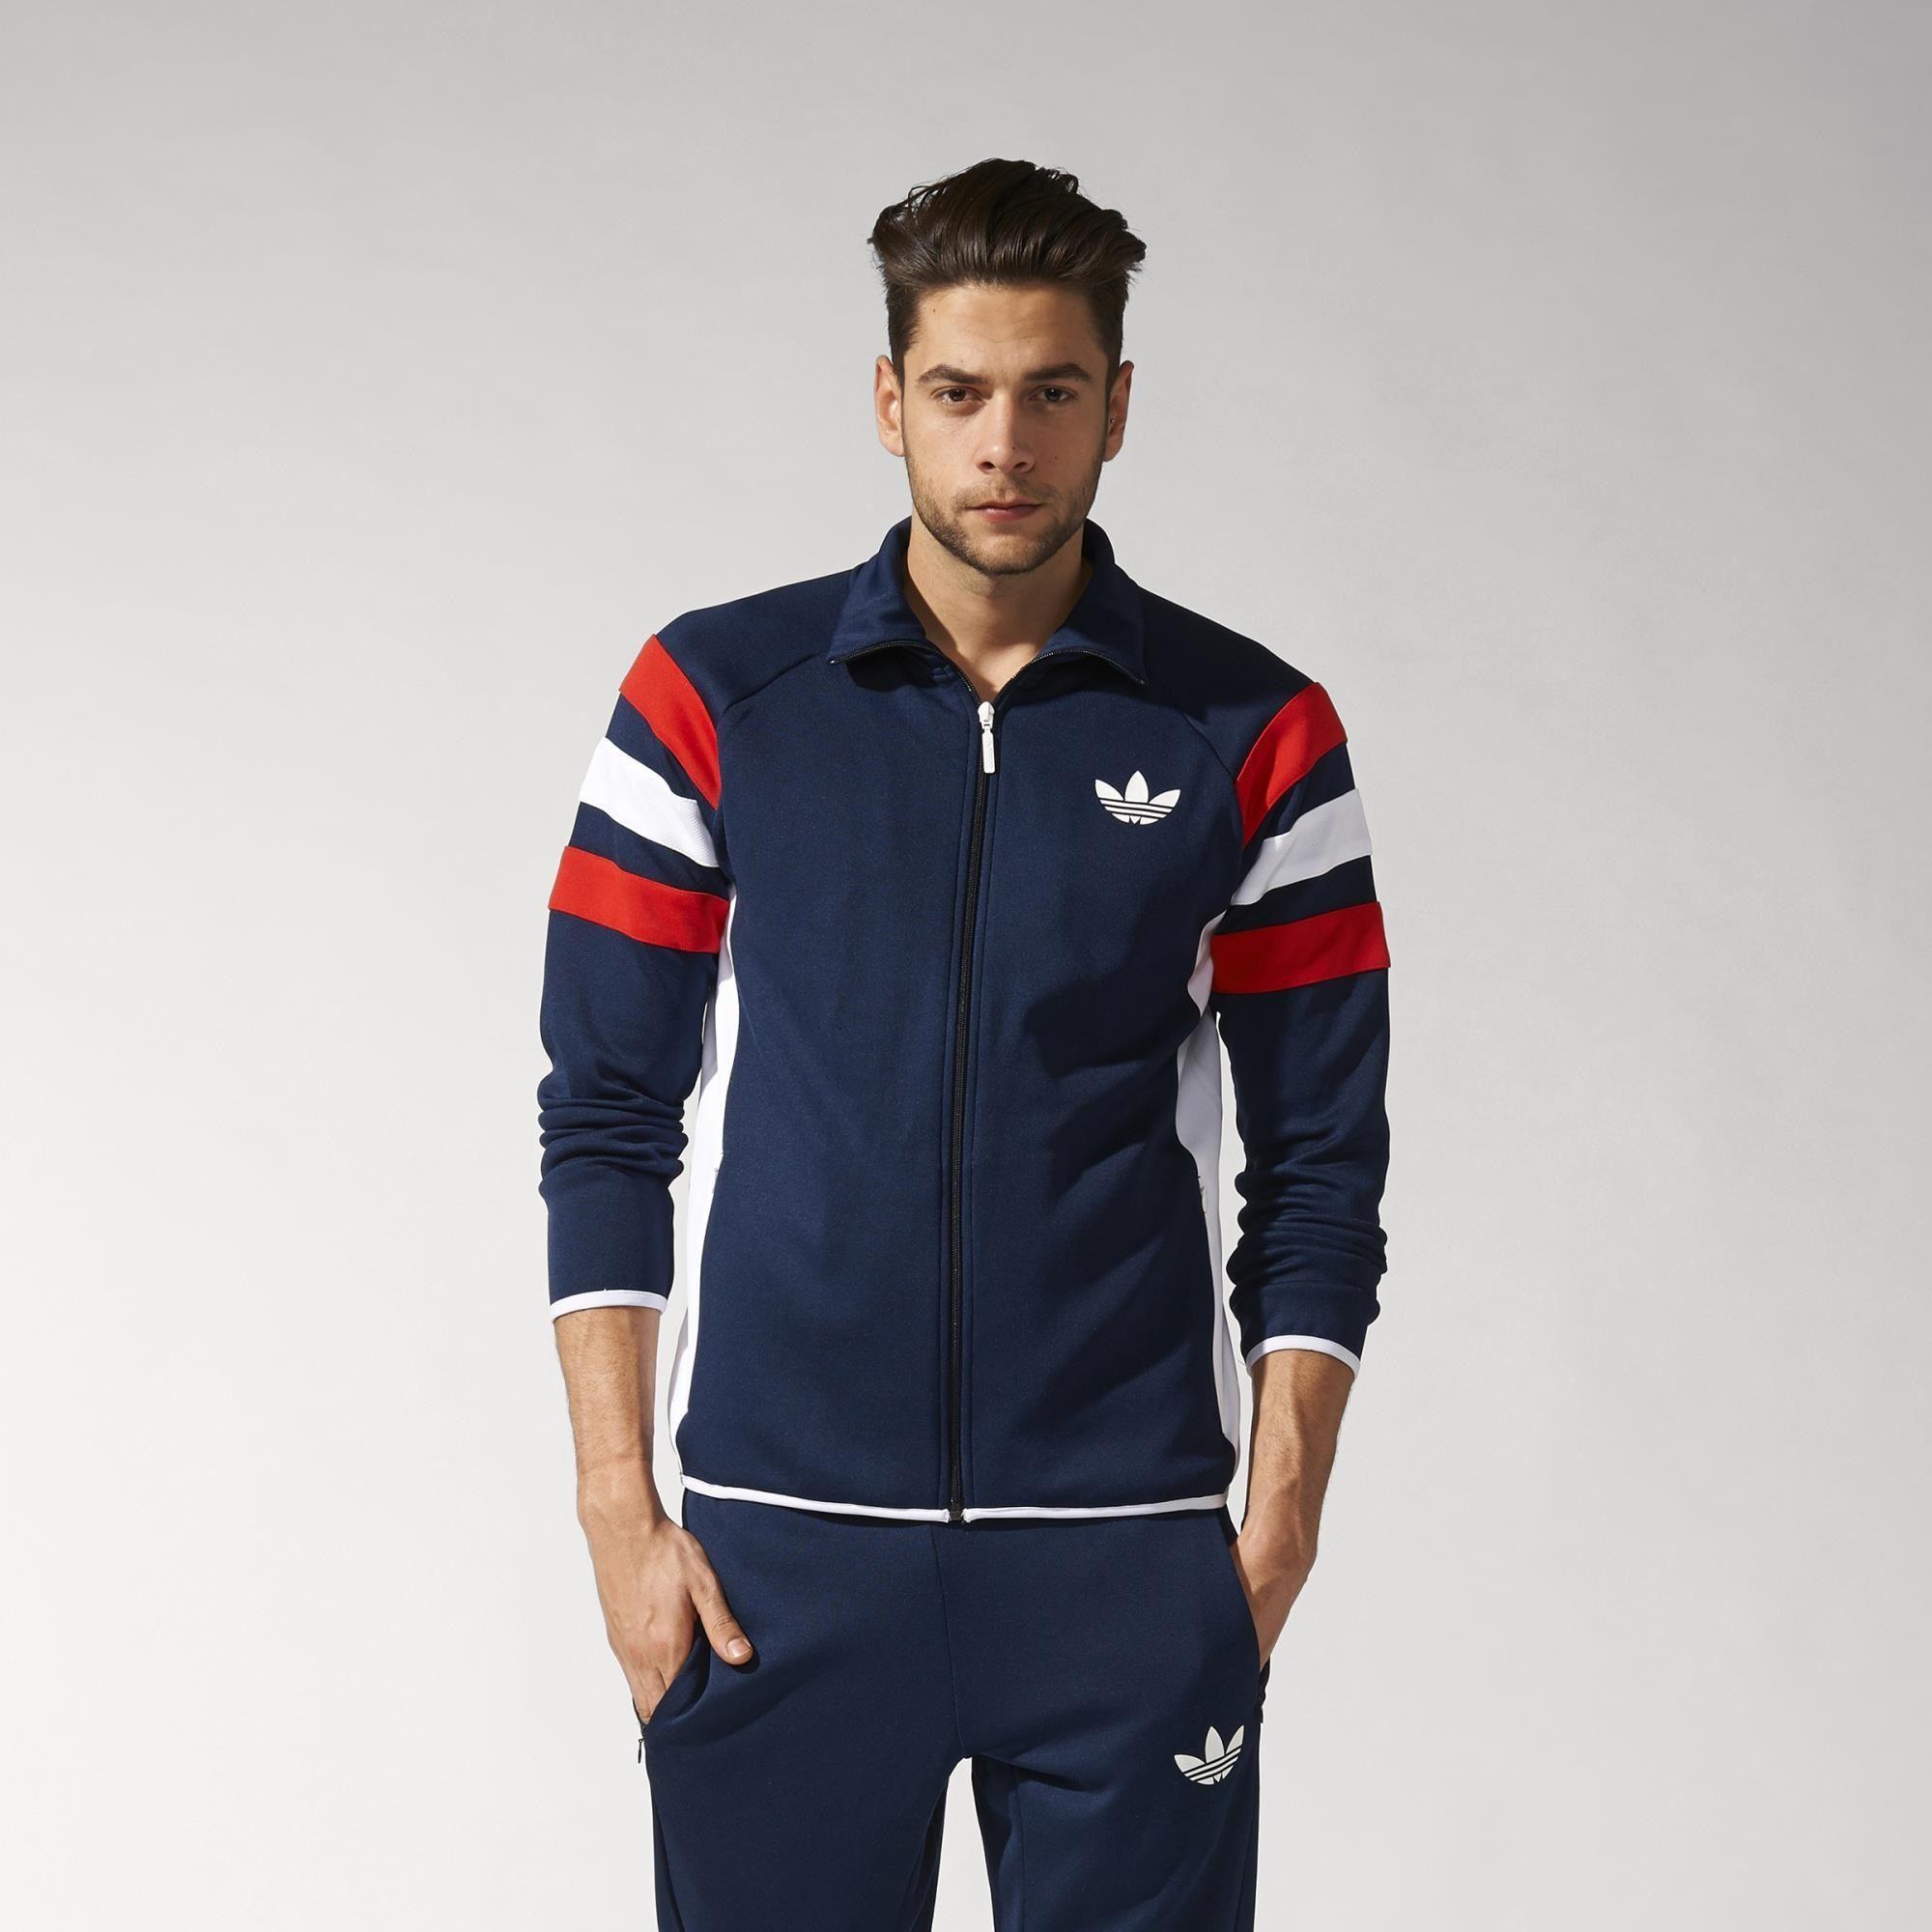 adidas trefoil jacket mens